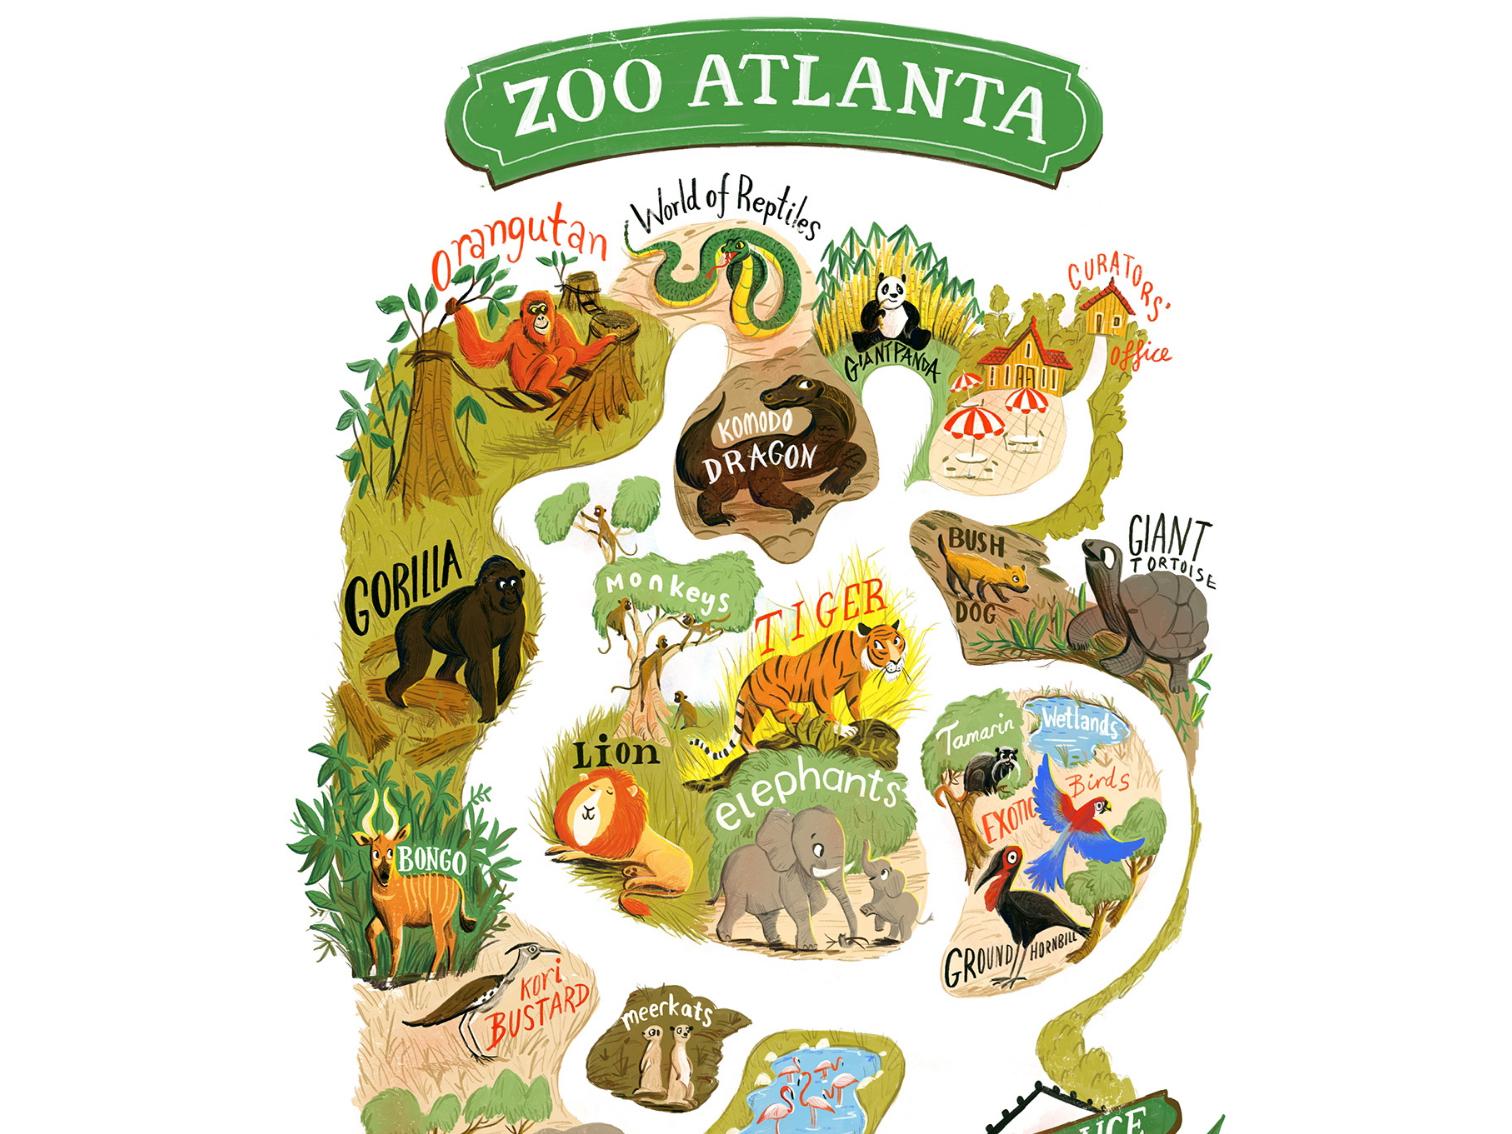 map of atlanta zoo Bridge To The Wild Atlanta Zoo Map By Migy On Dribbble map of atlanta zoo